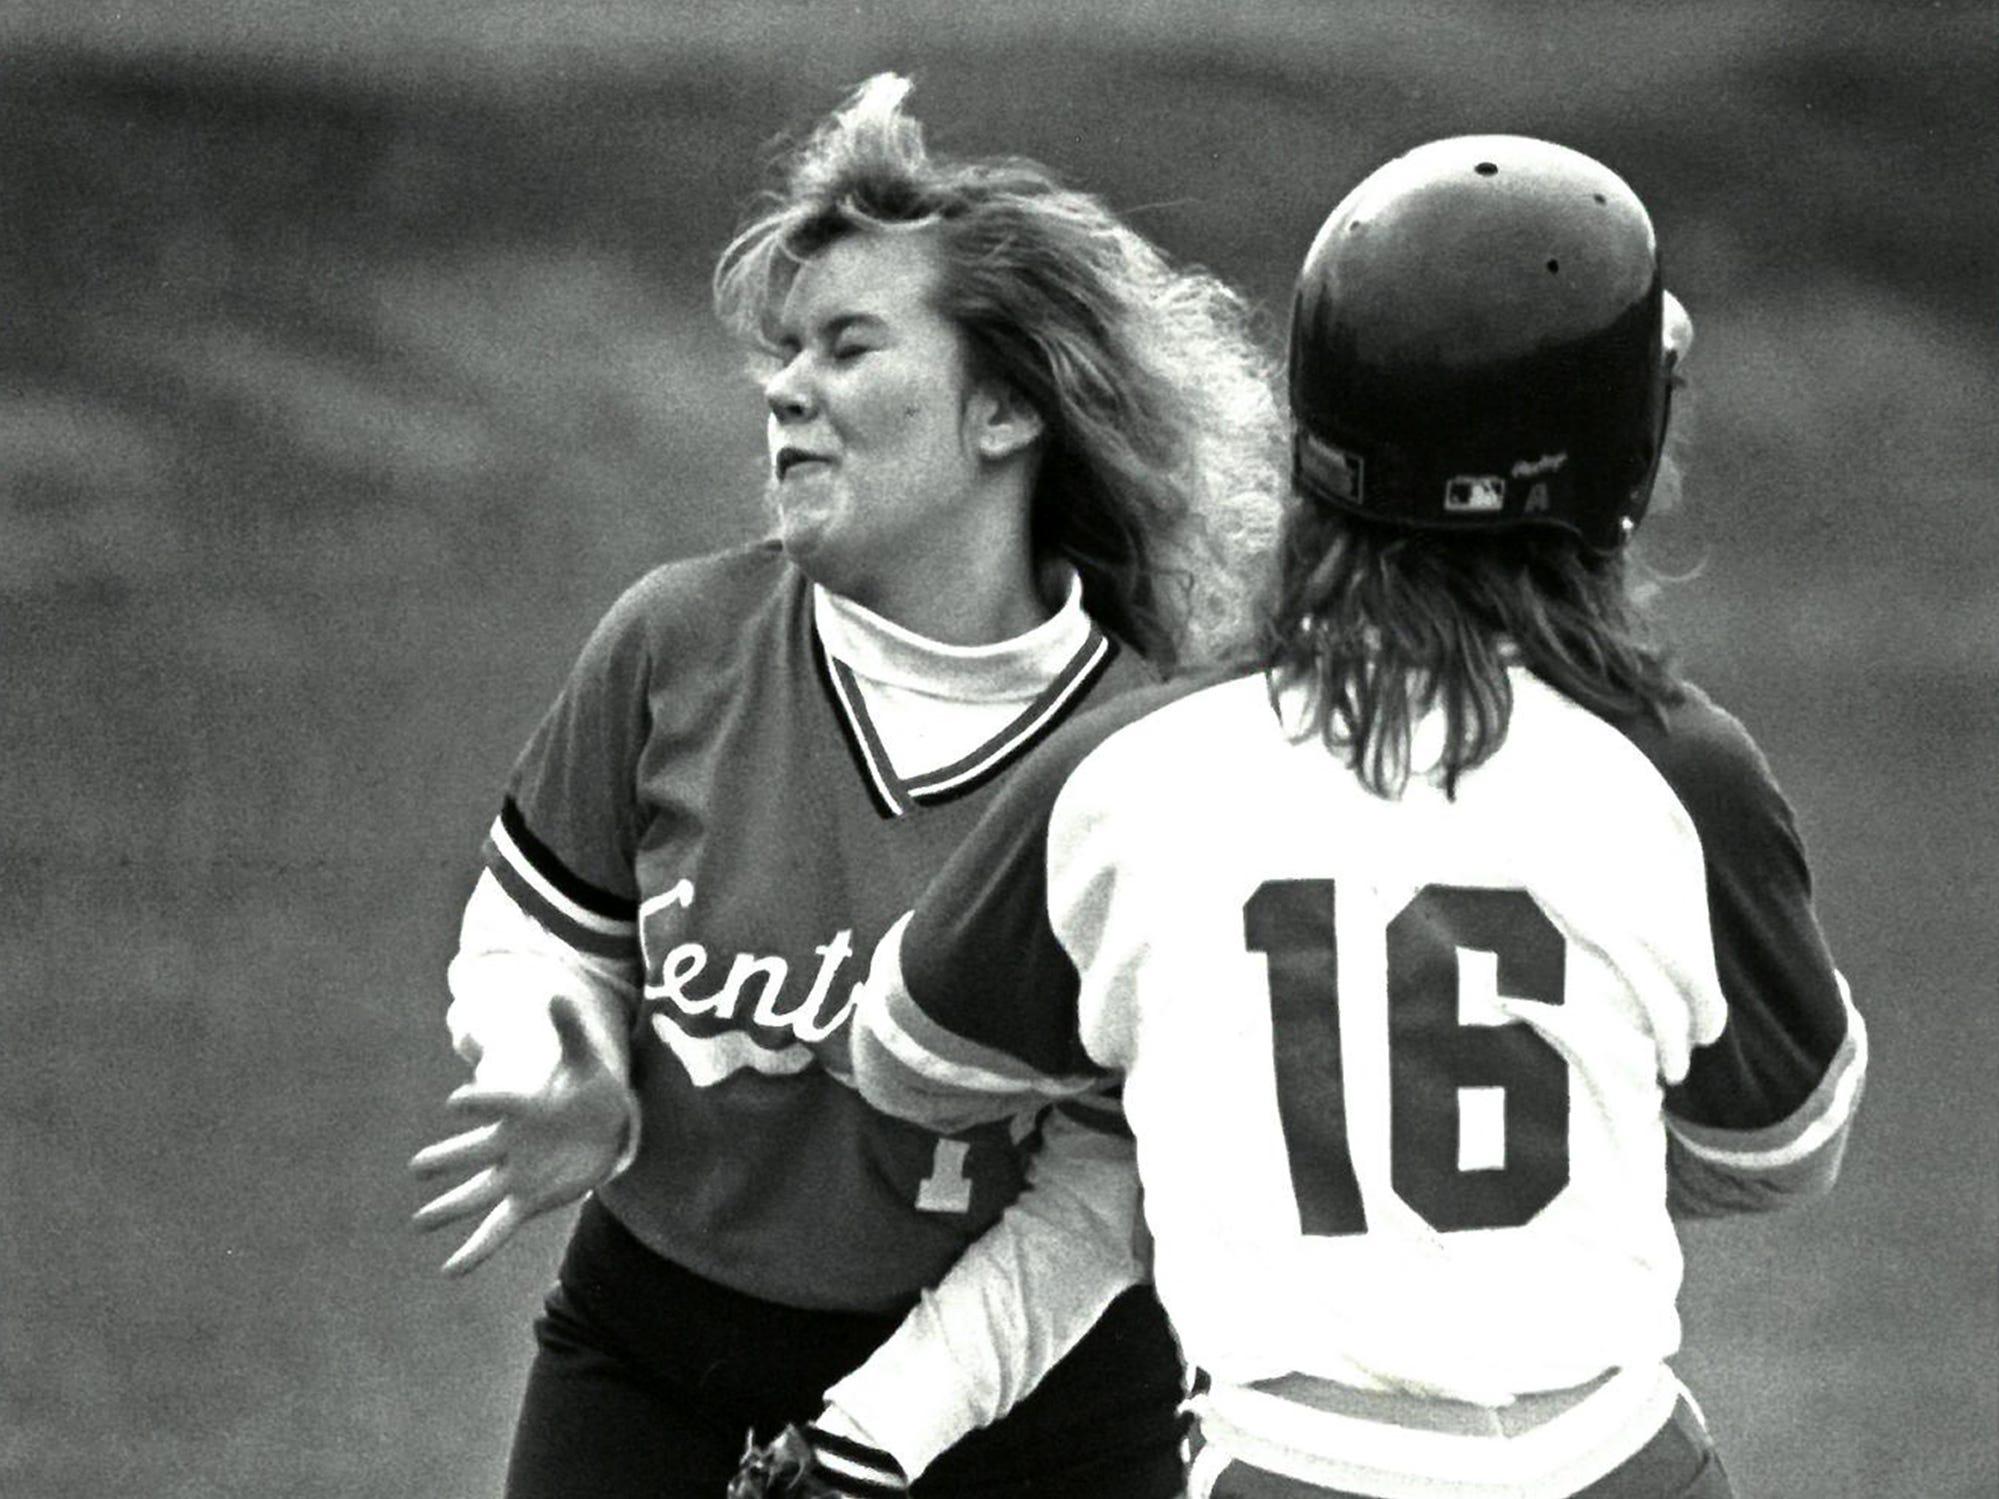 04/14/88CK Heidi Westhoff and NK Laura Jurgwirth